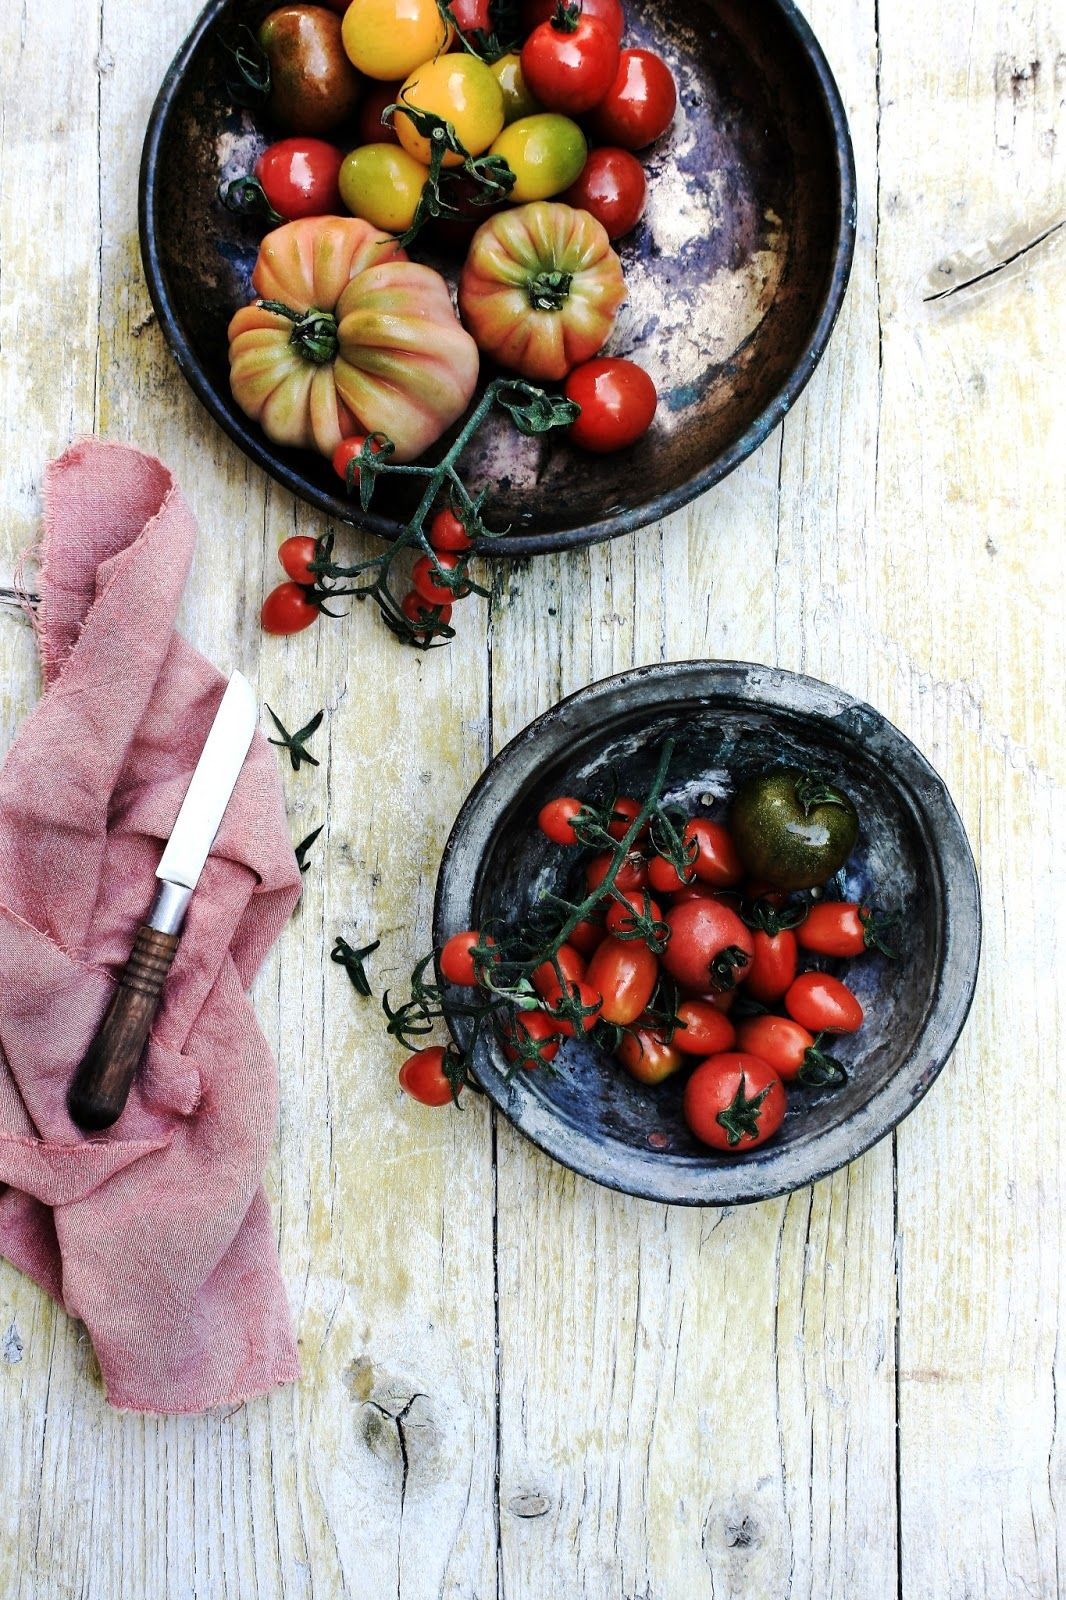 tomatoes.jpg (1066×1600)